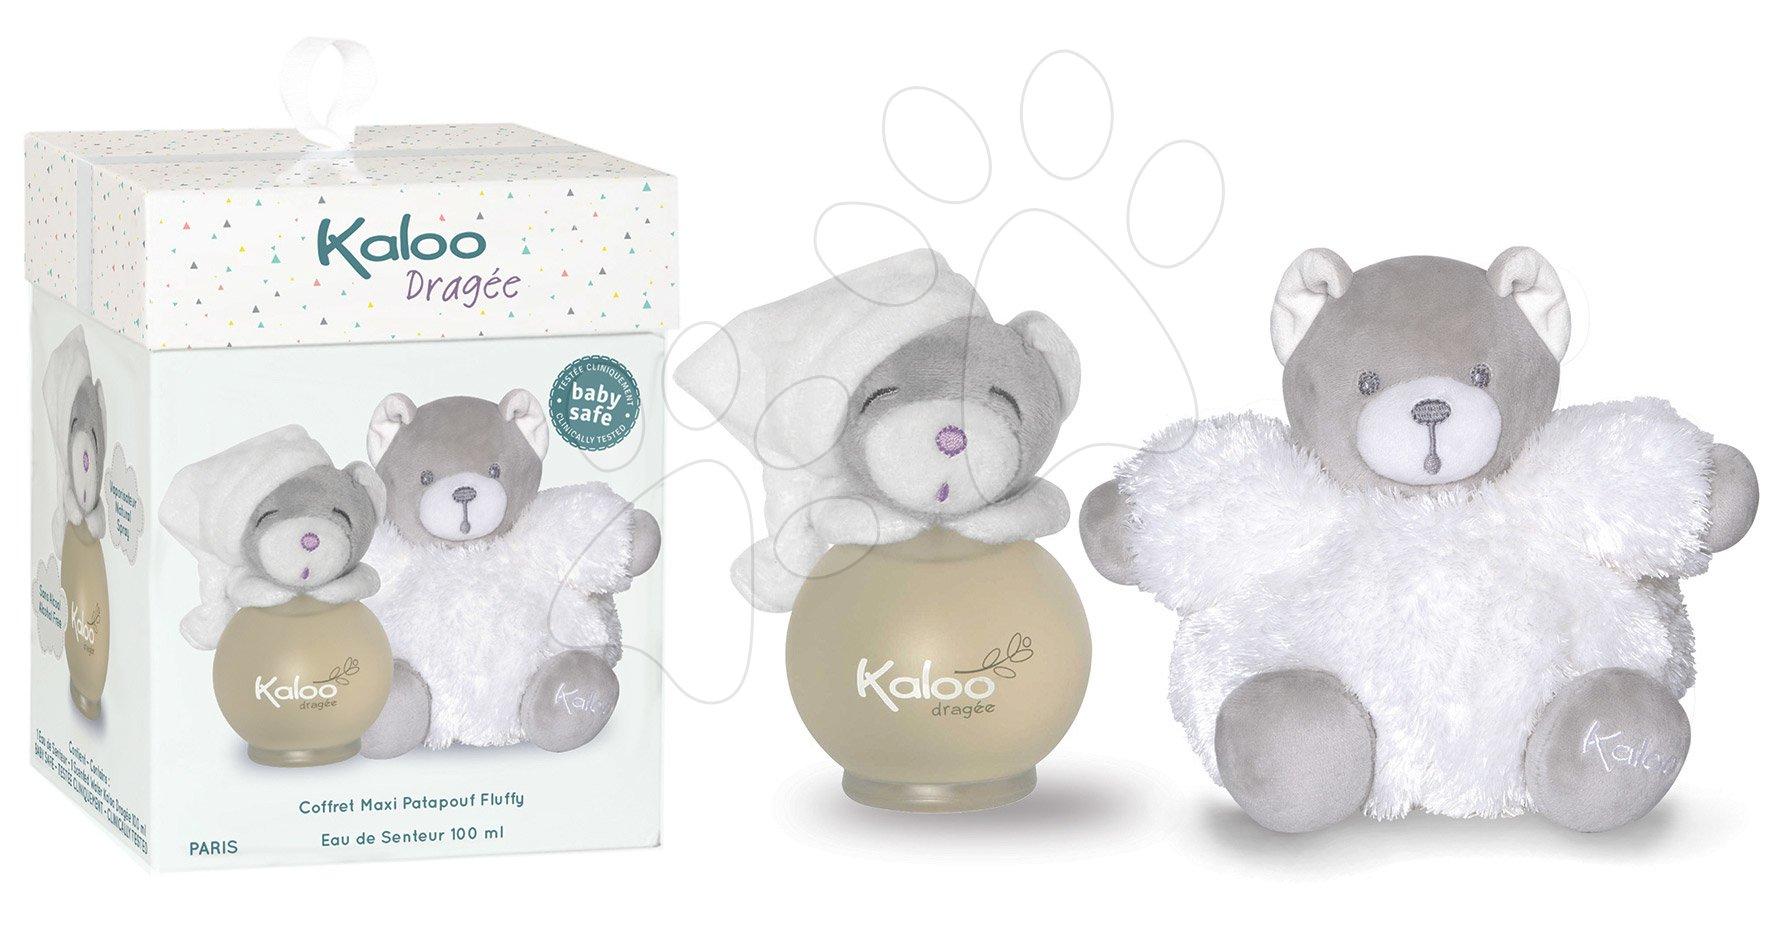 Toaletná voda pre najmenších Dragée Maxi Fluffy Set Kaloo Scented Water 100 ml biely medveď od 3 mes